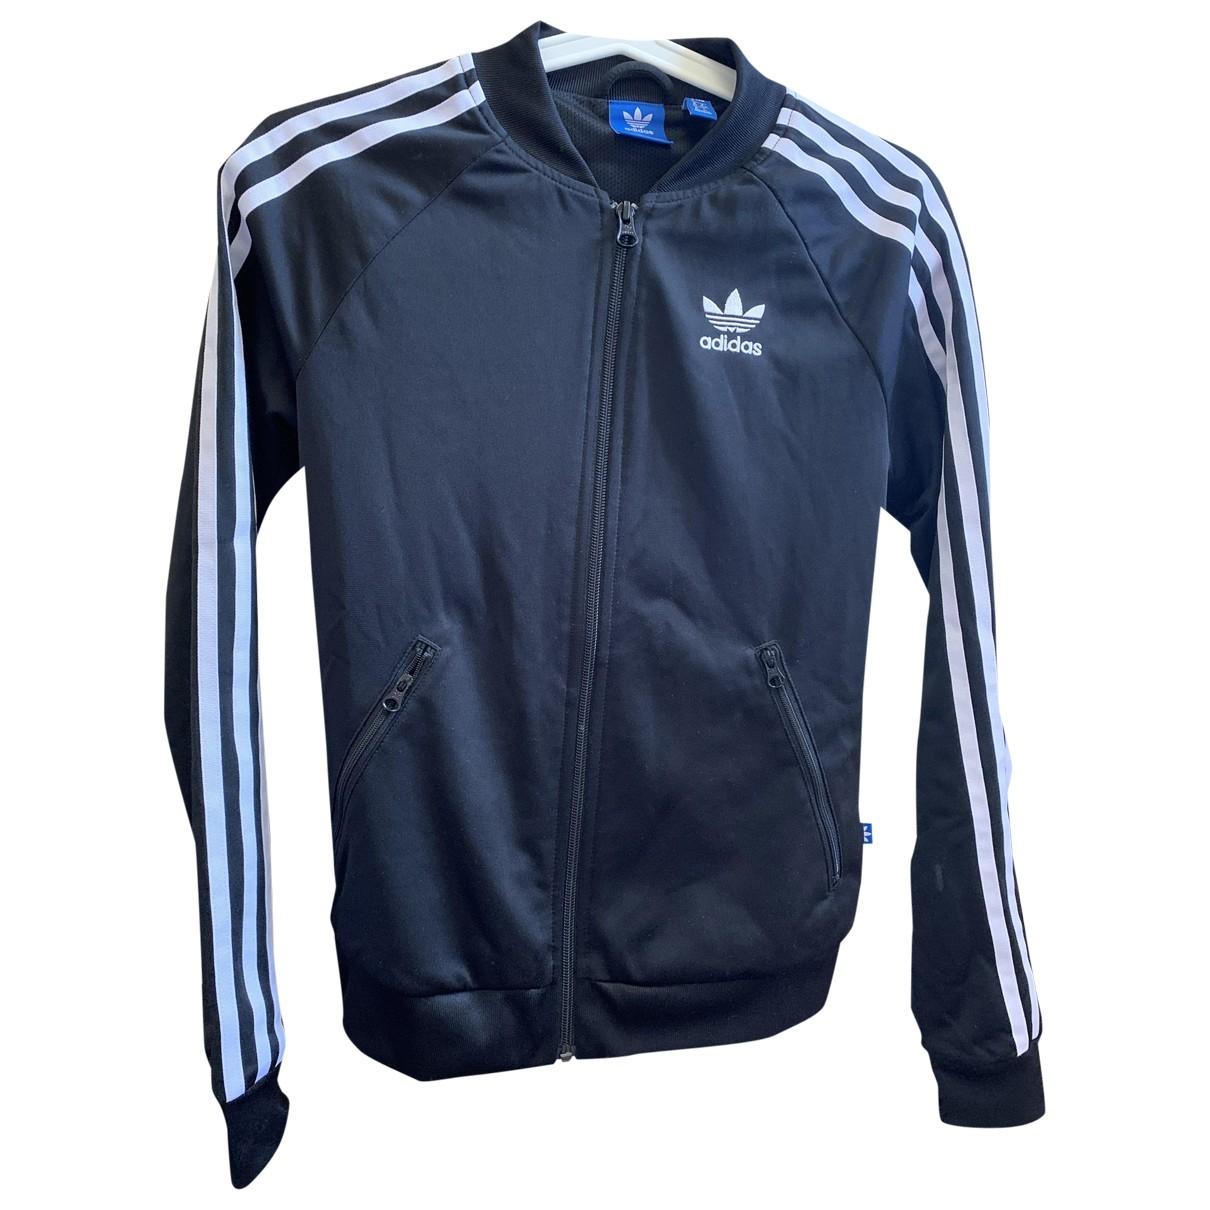 Adidas \N Black jacket for Women S International